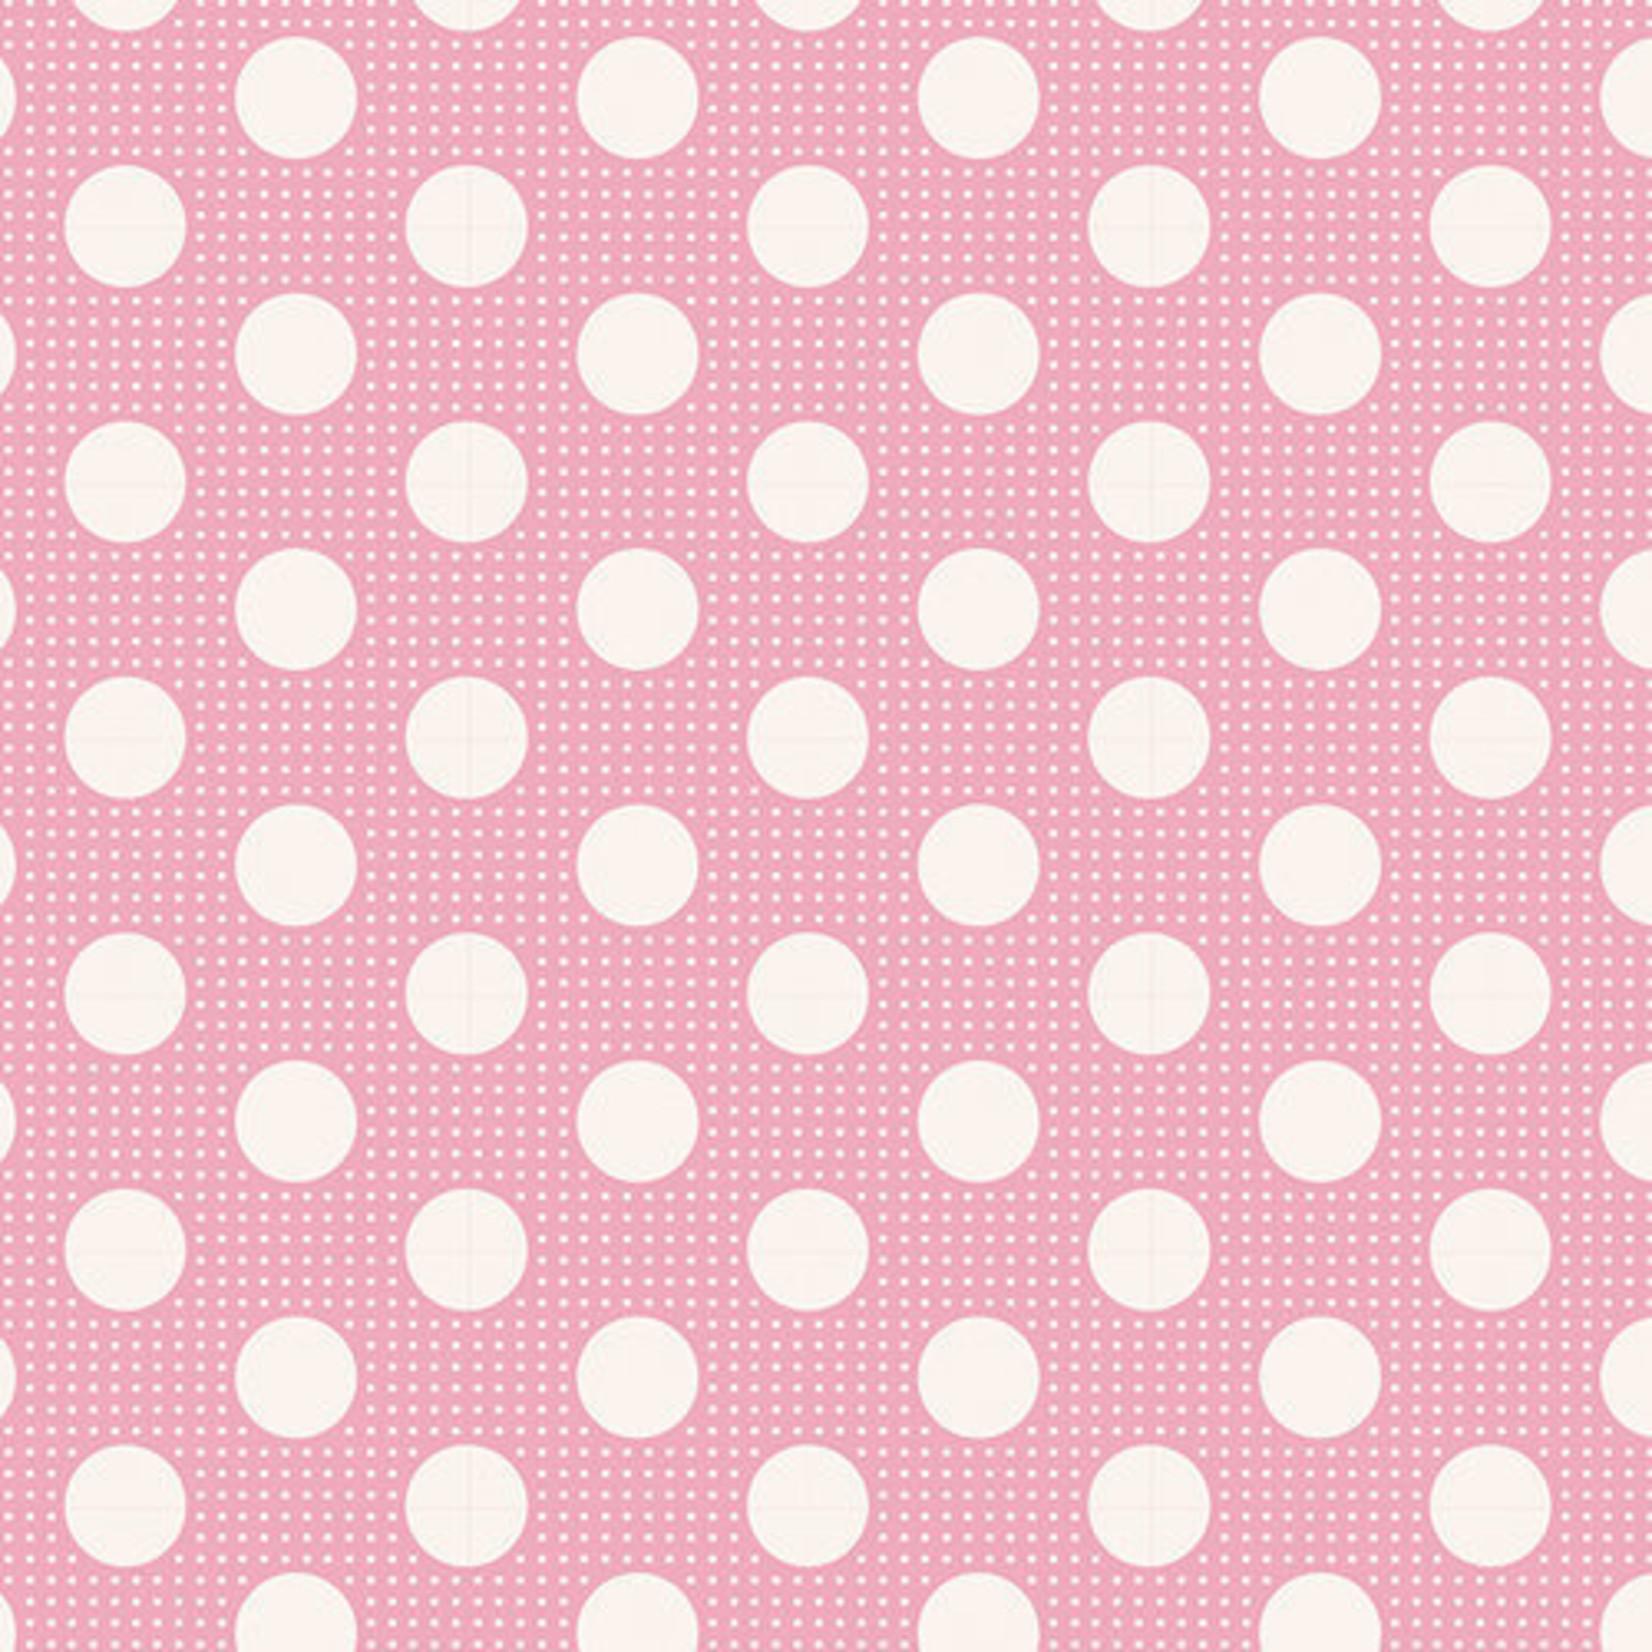 Tilda Basics Medium Dots, Pink - per cm or $20/m